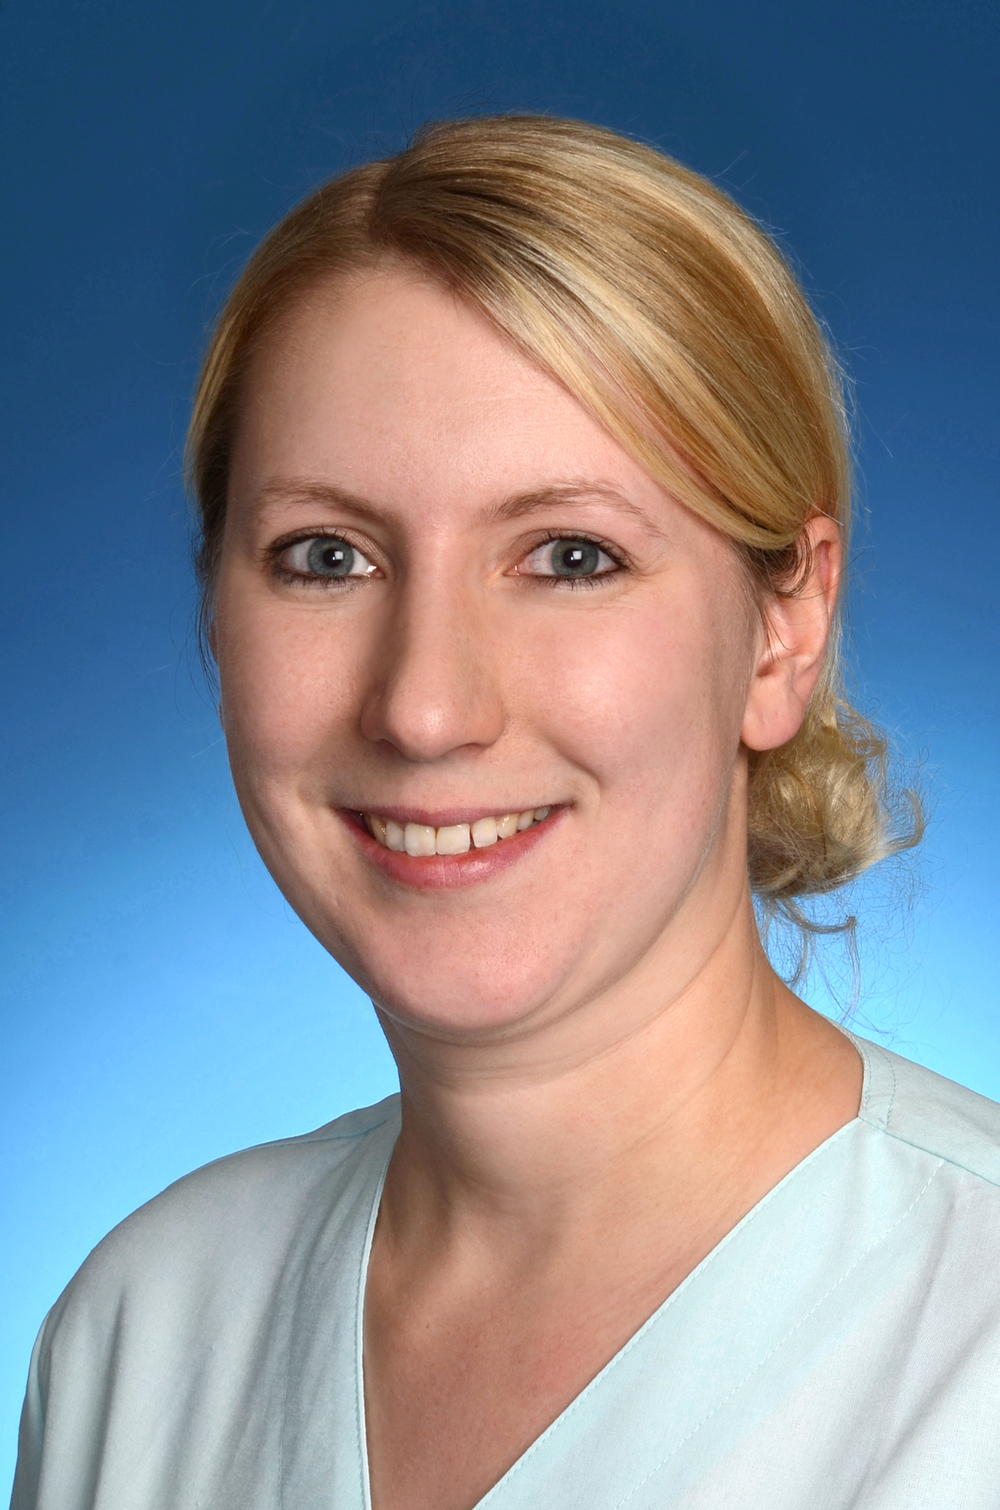 Frau Melanie Steinmetz